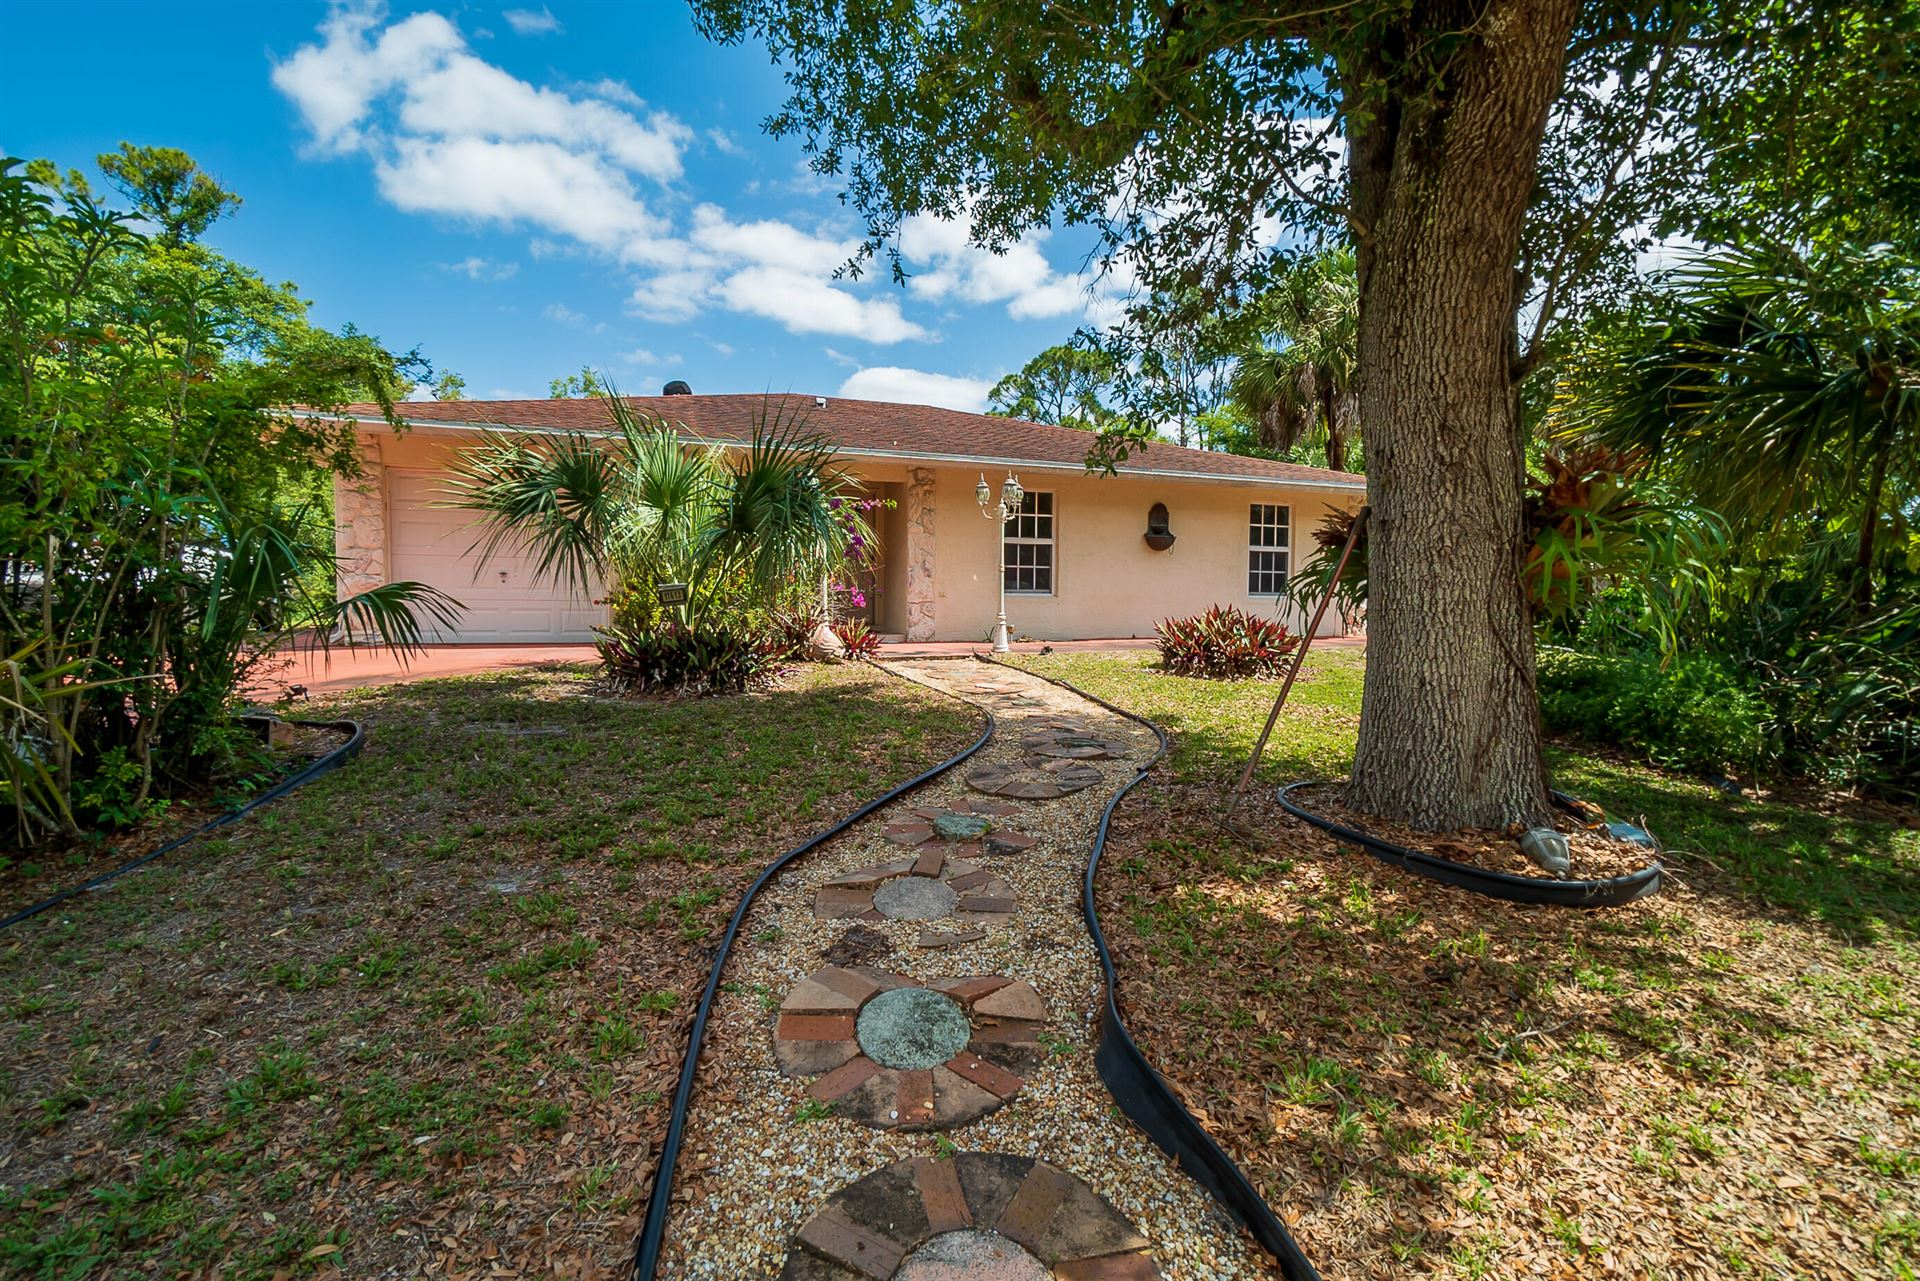 11613 41st Court N, West Palm Beach, FL 33411 - MLS#: RX-10712292